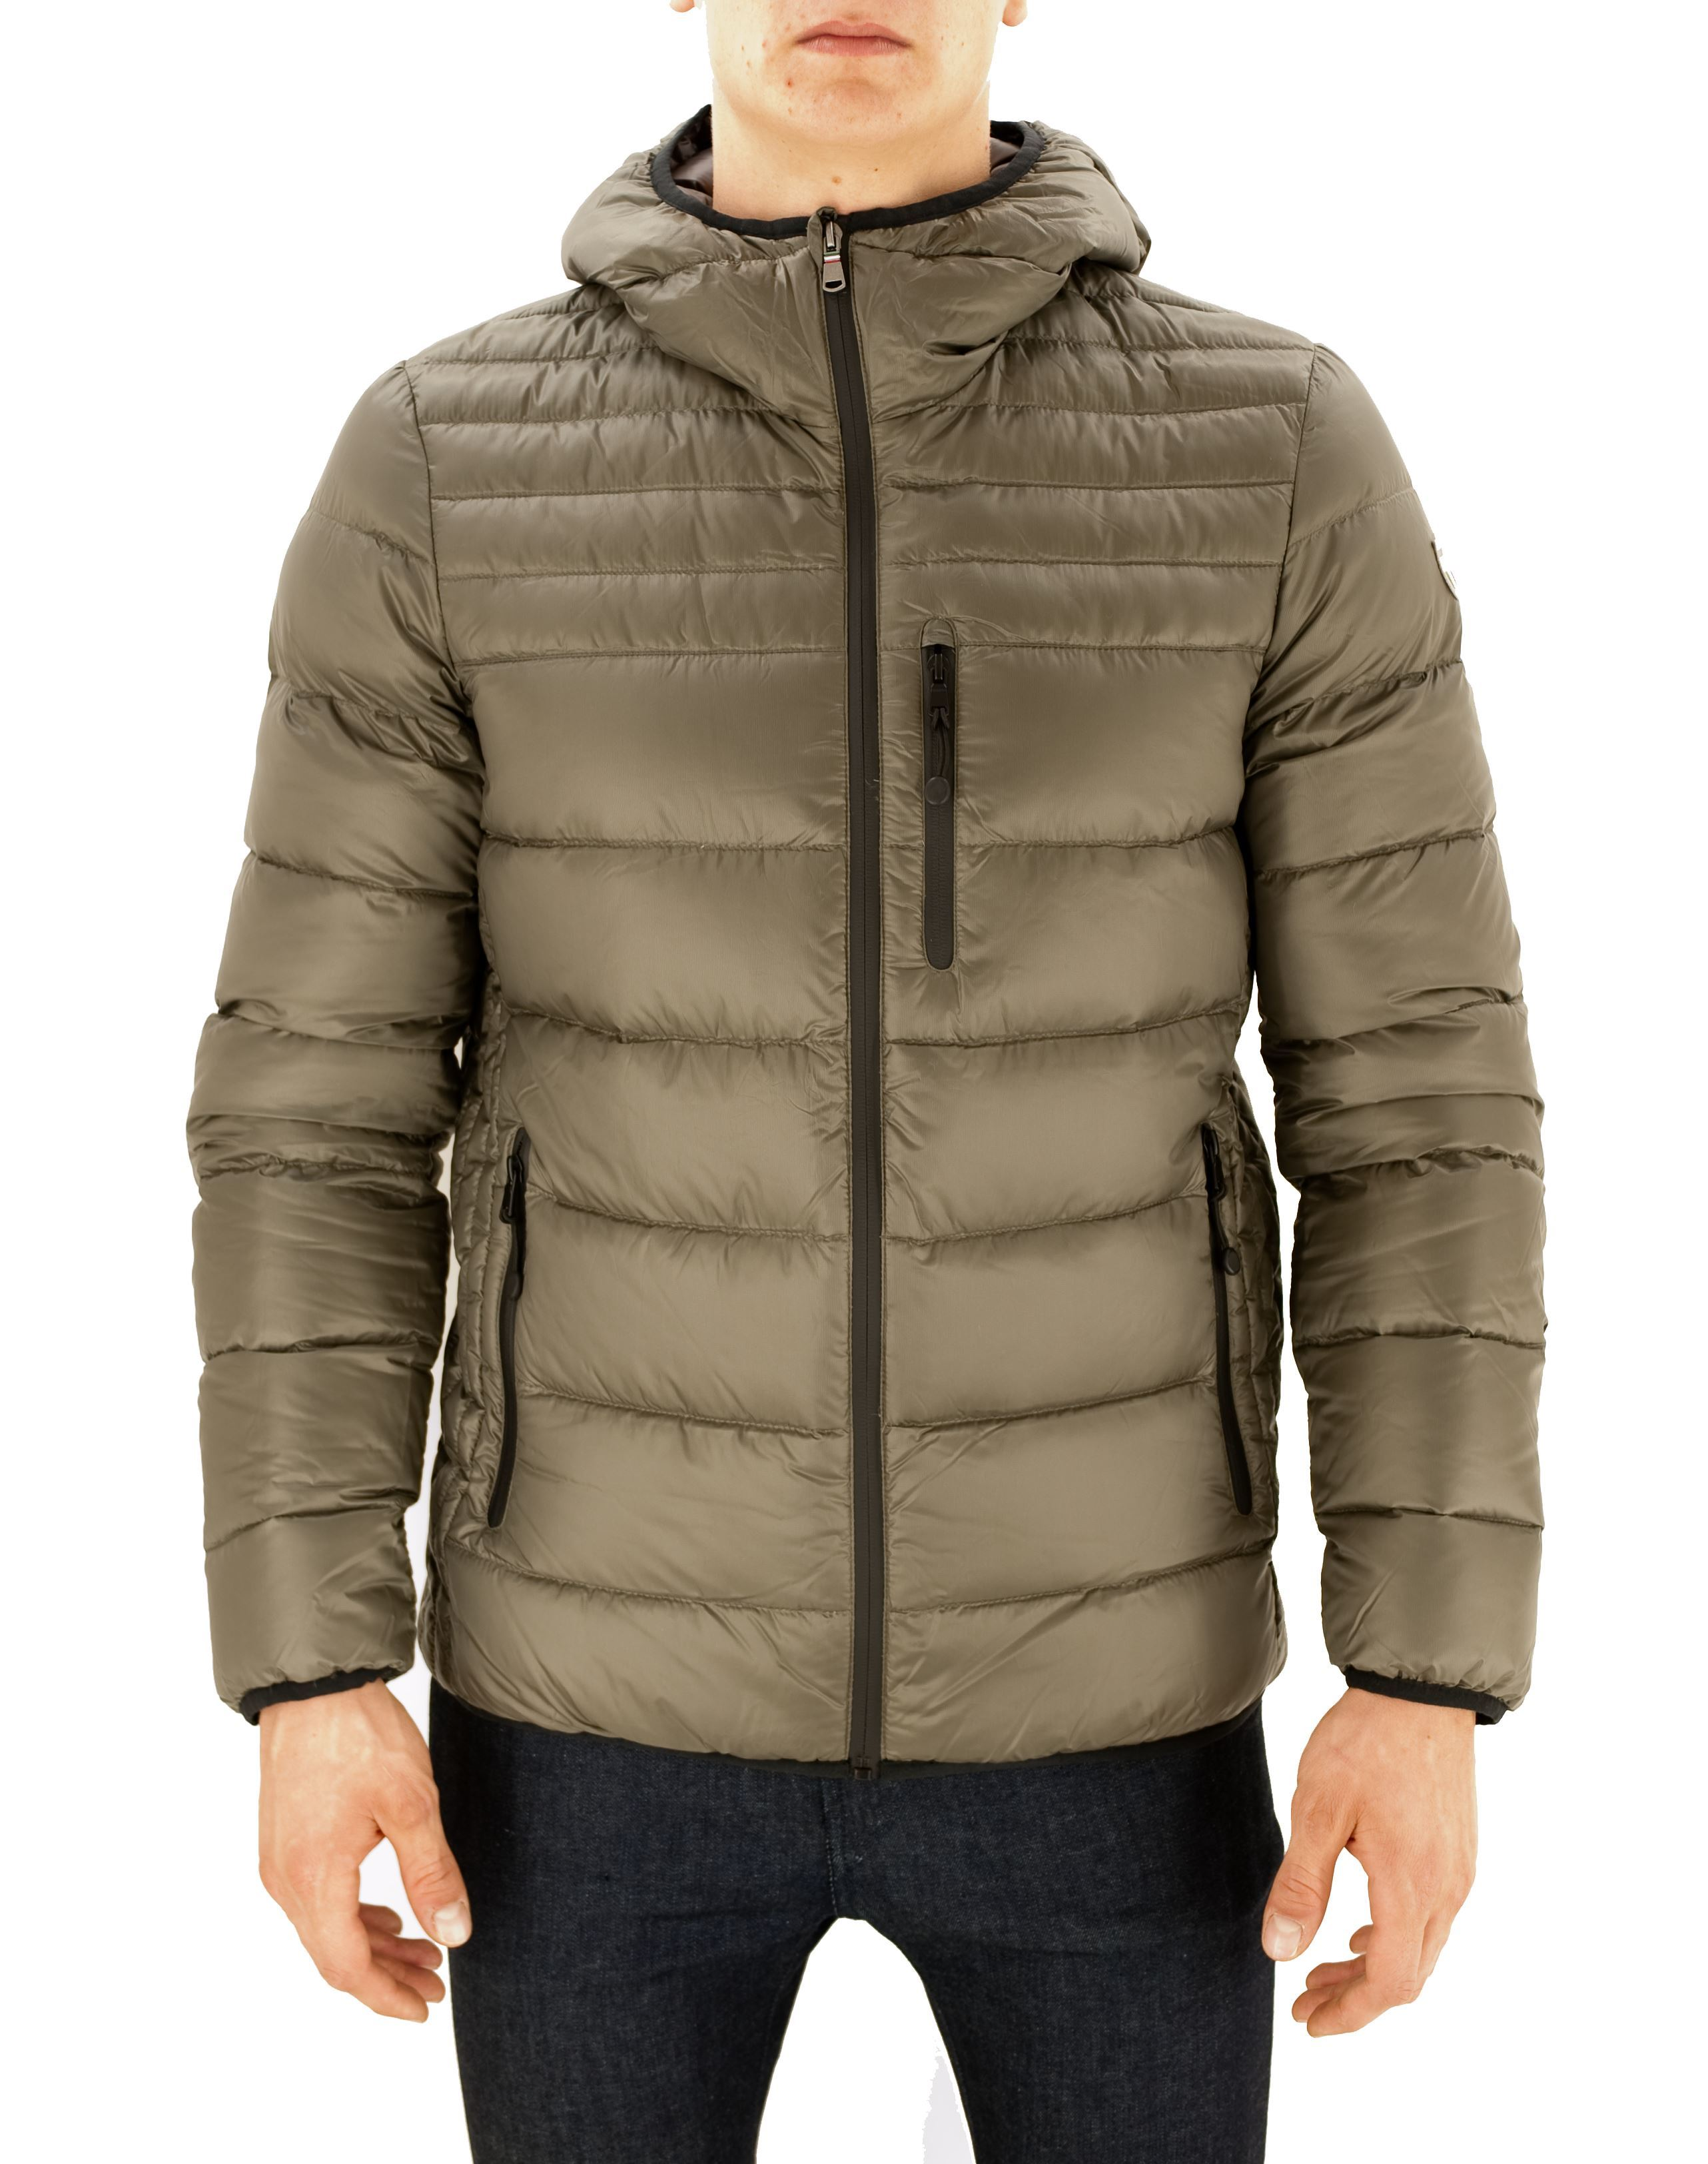 Dolomite laurel green down jacket Regular fit - Floccari Store f62743586dcd